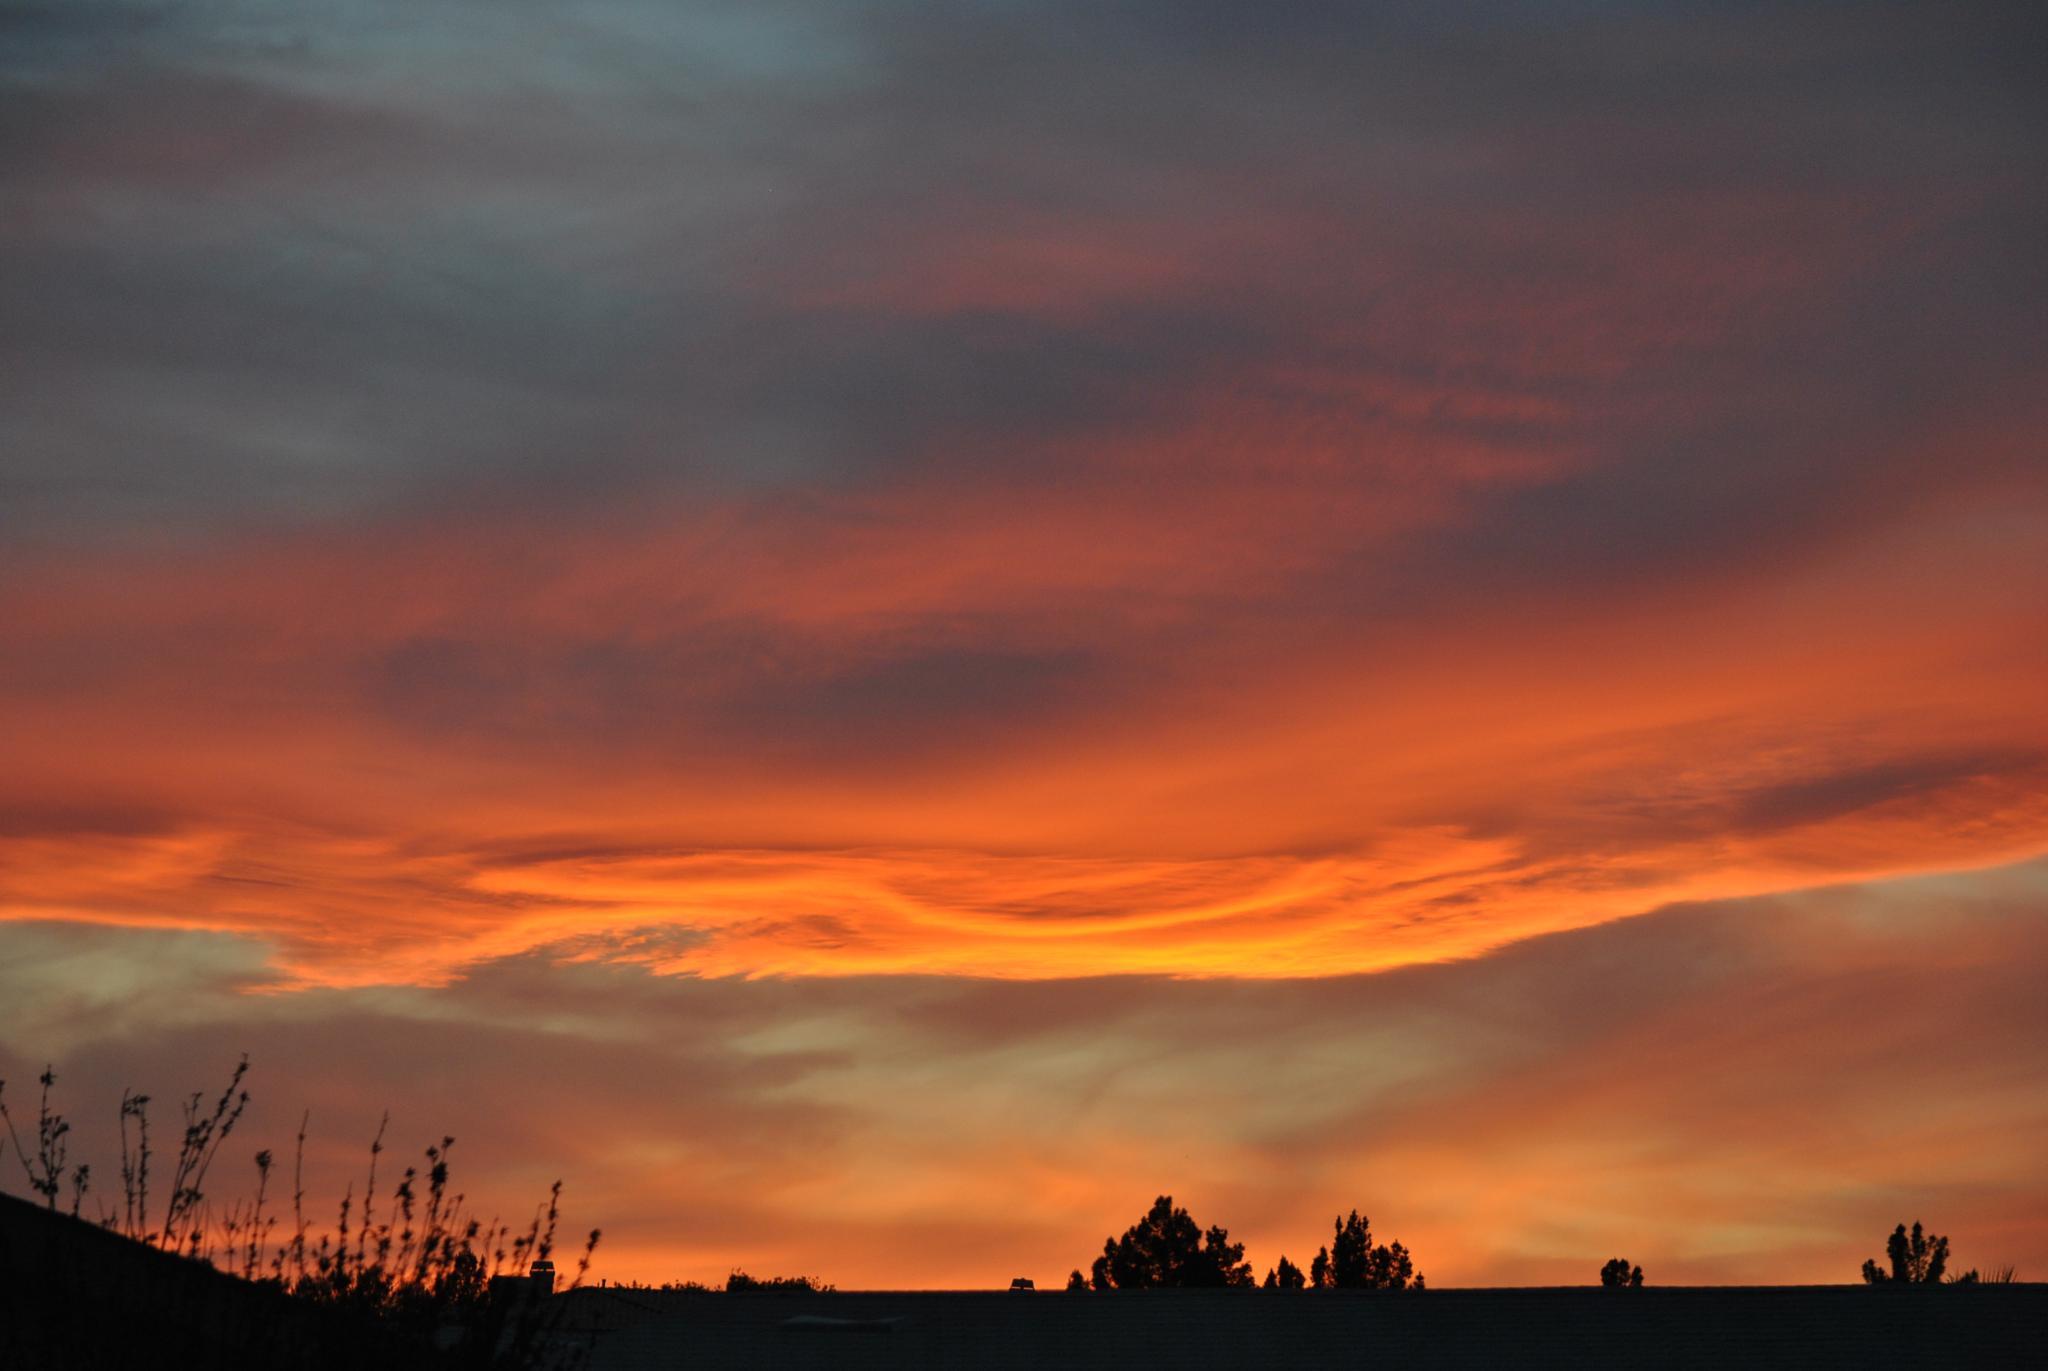 Las Vegas Sunset by crlarsen